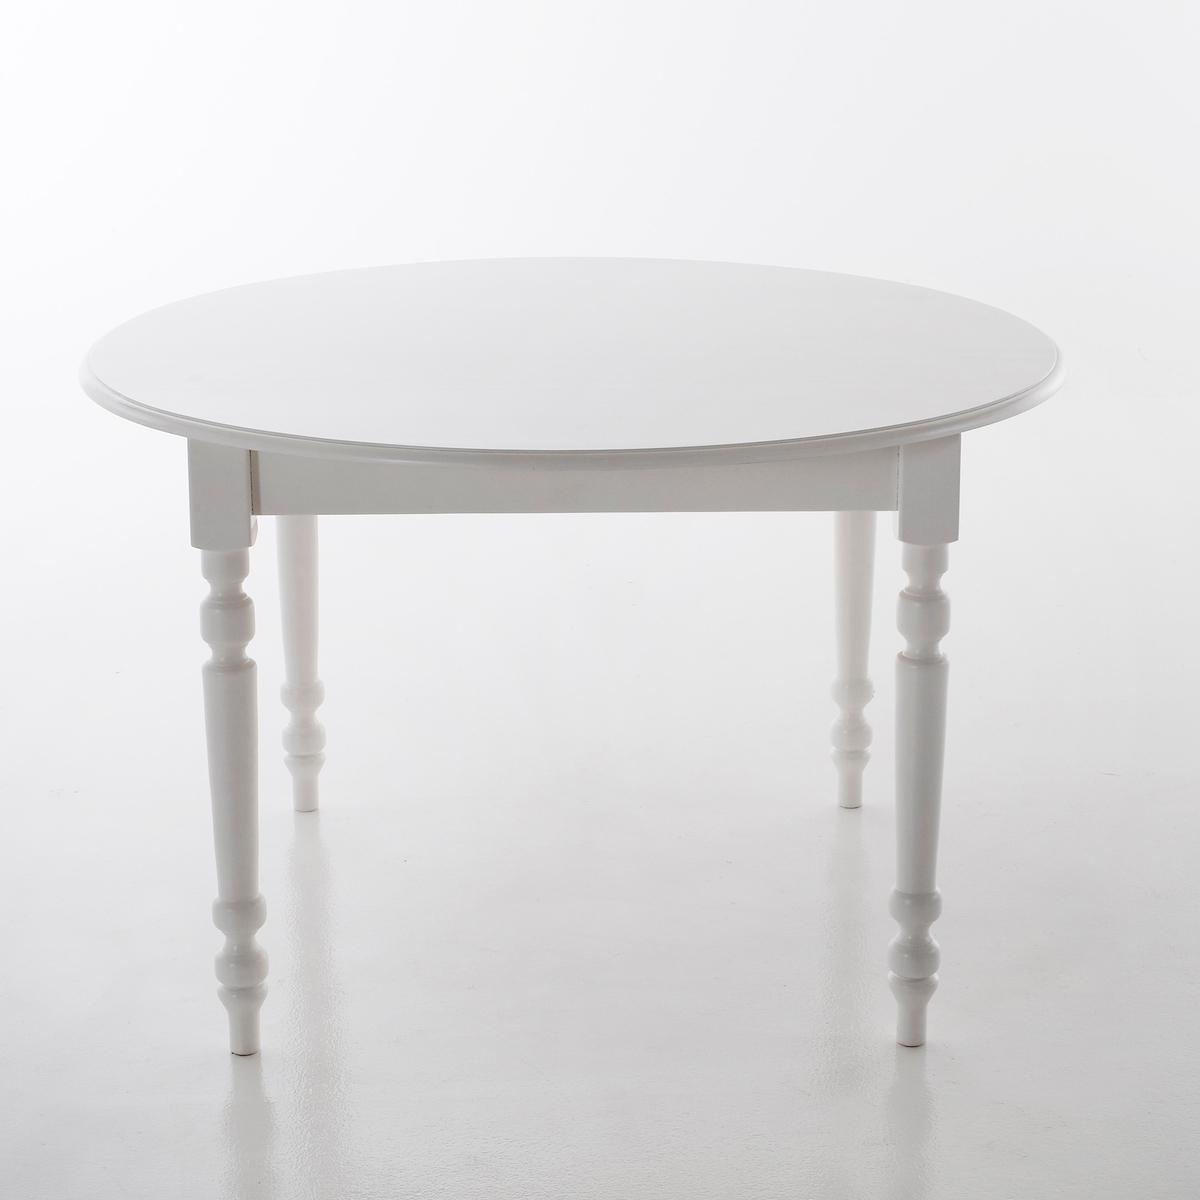 Стол LaRedoute Обеденный круглый на 4 персоны Authentic Style 4 персоны белый круглый laredoute стол на 4 8 персон authentic style 8 персоны белый